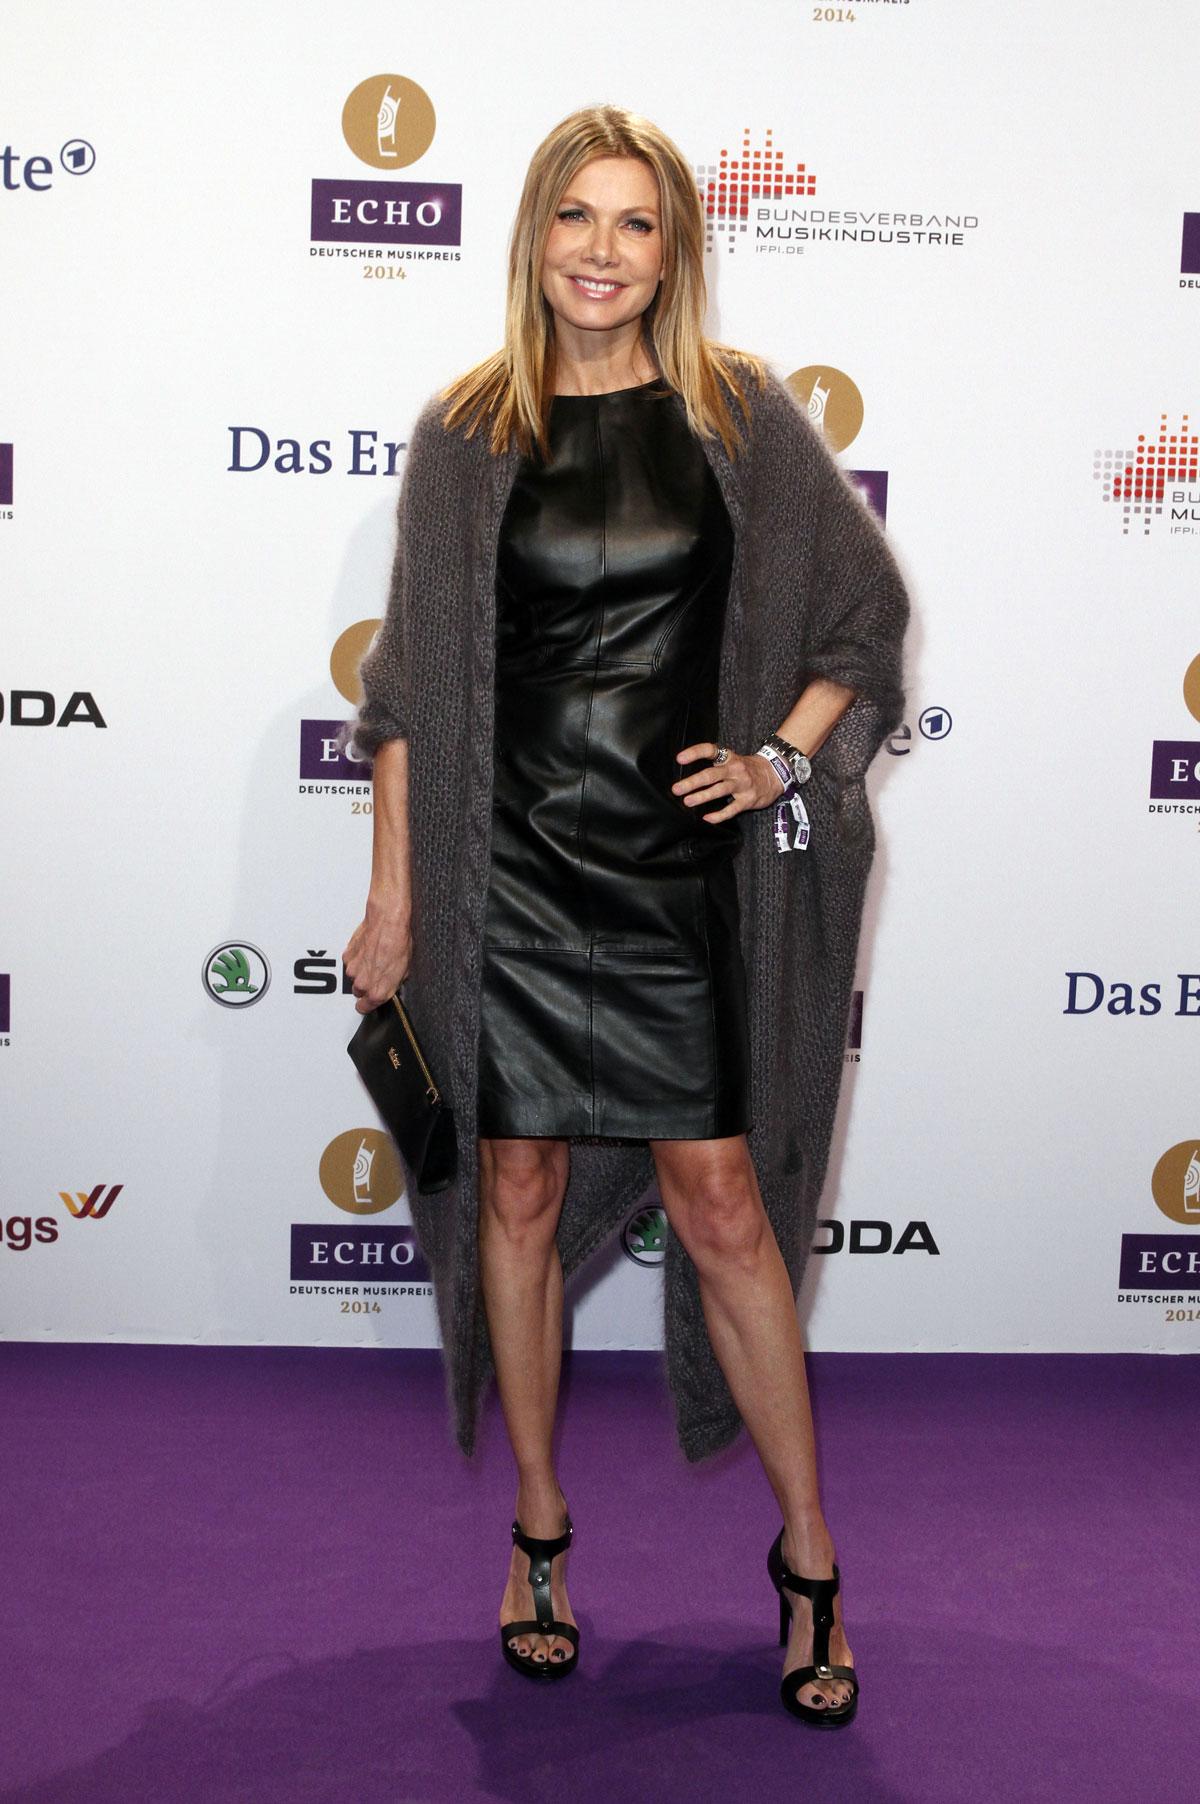 Ursula Karven attends the Echo award 2014